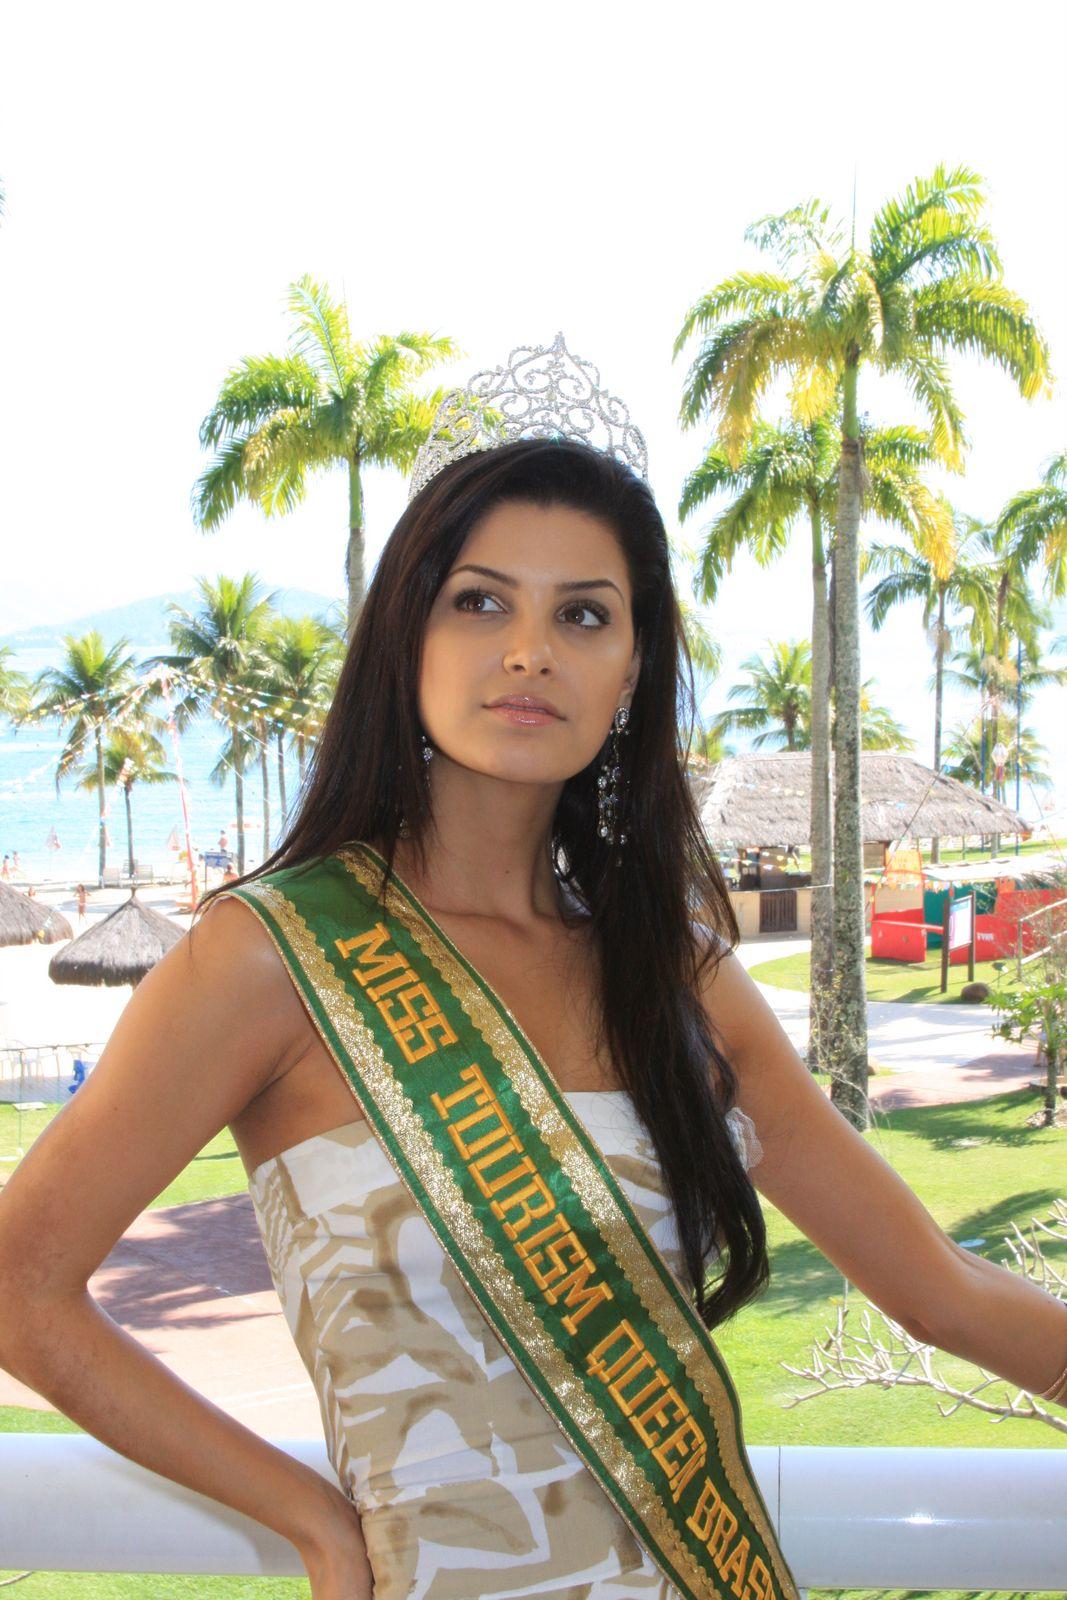 vivian noronha, rainha hispanoamericana 2008. suplente. - Página 4 397d3ef6